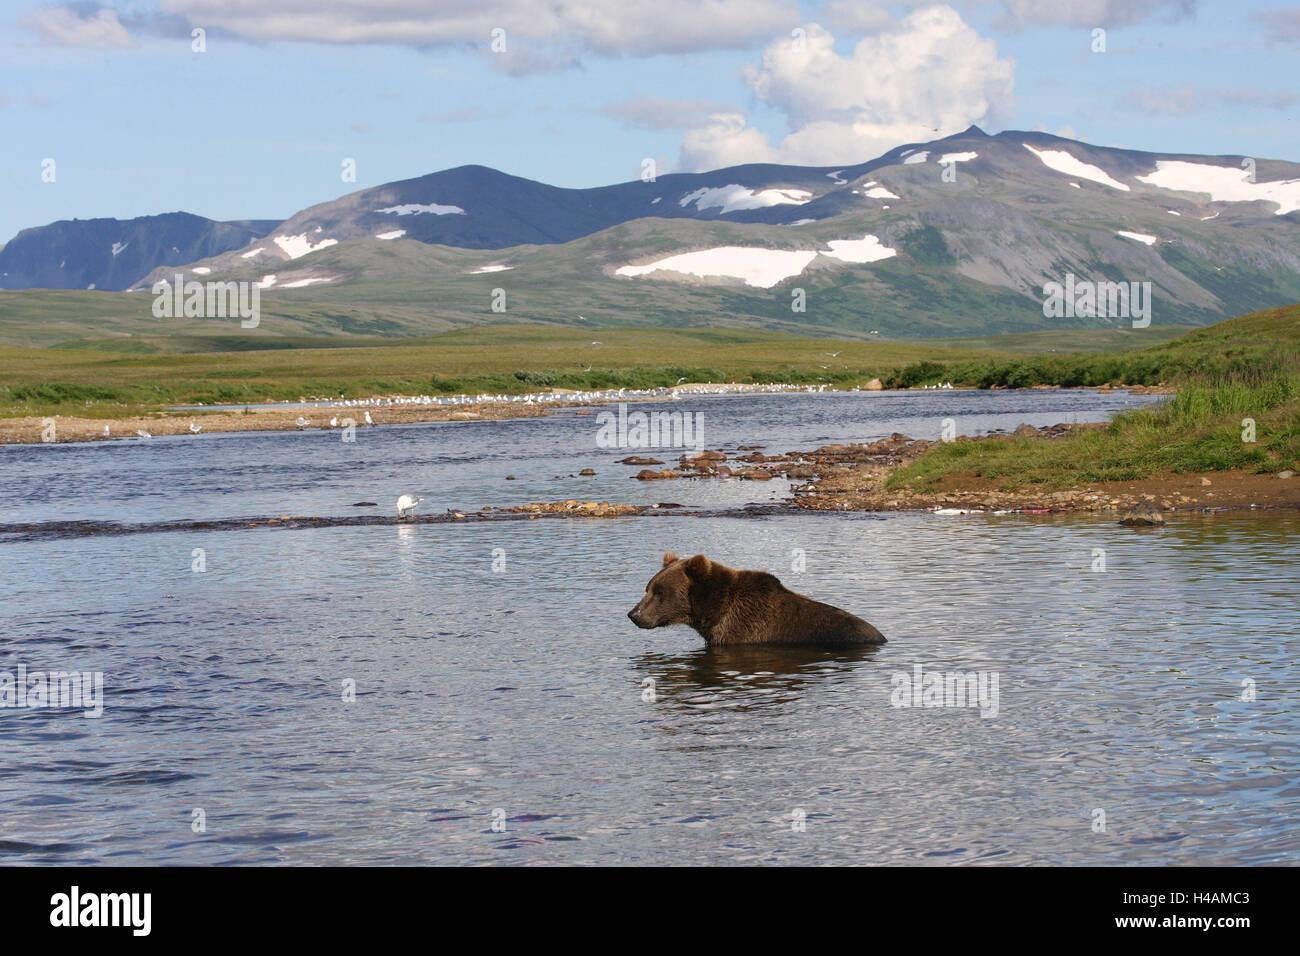 Alaska, Katmai national park, scenery, river, Grizzly, - Stock Image